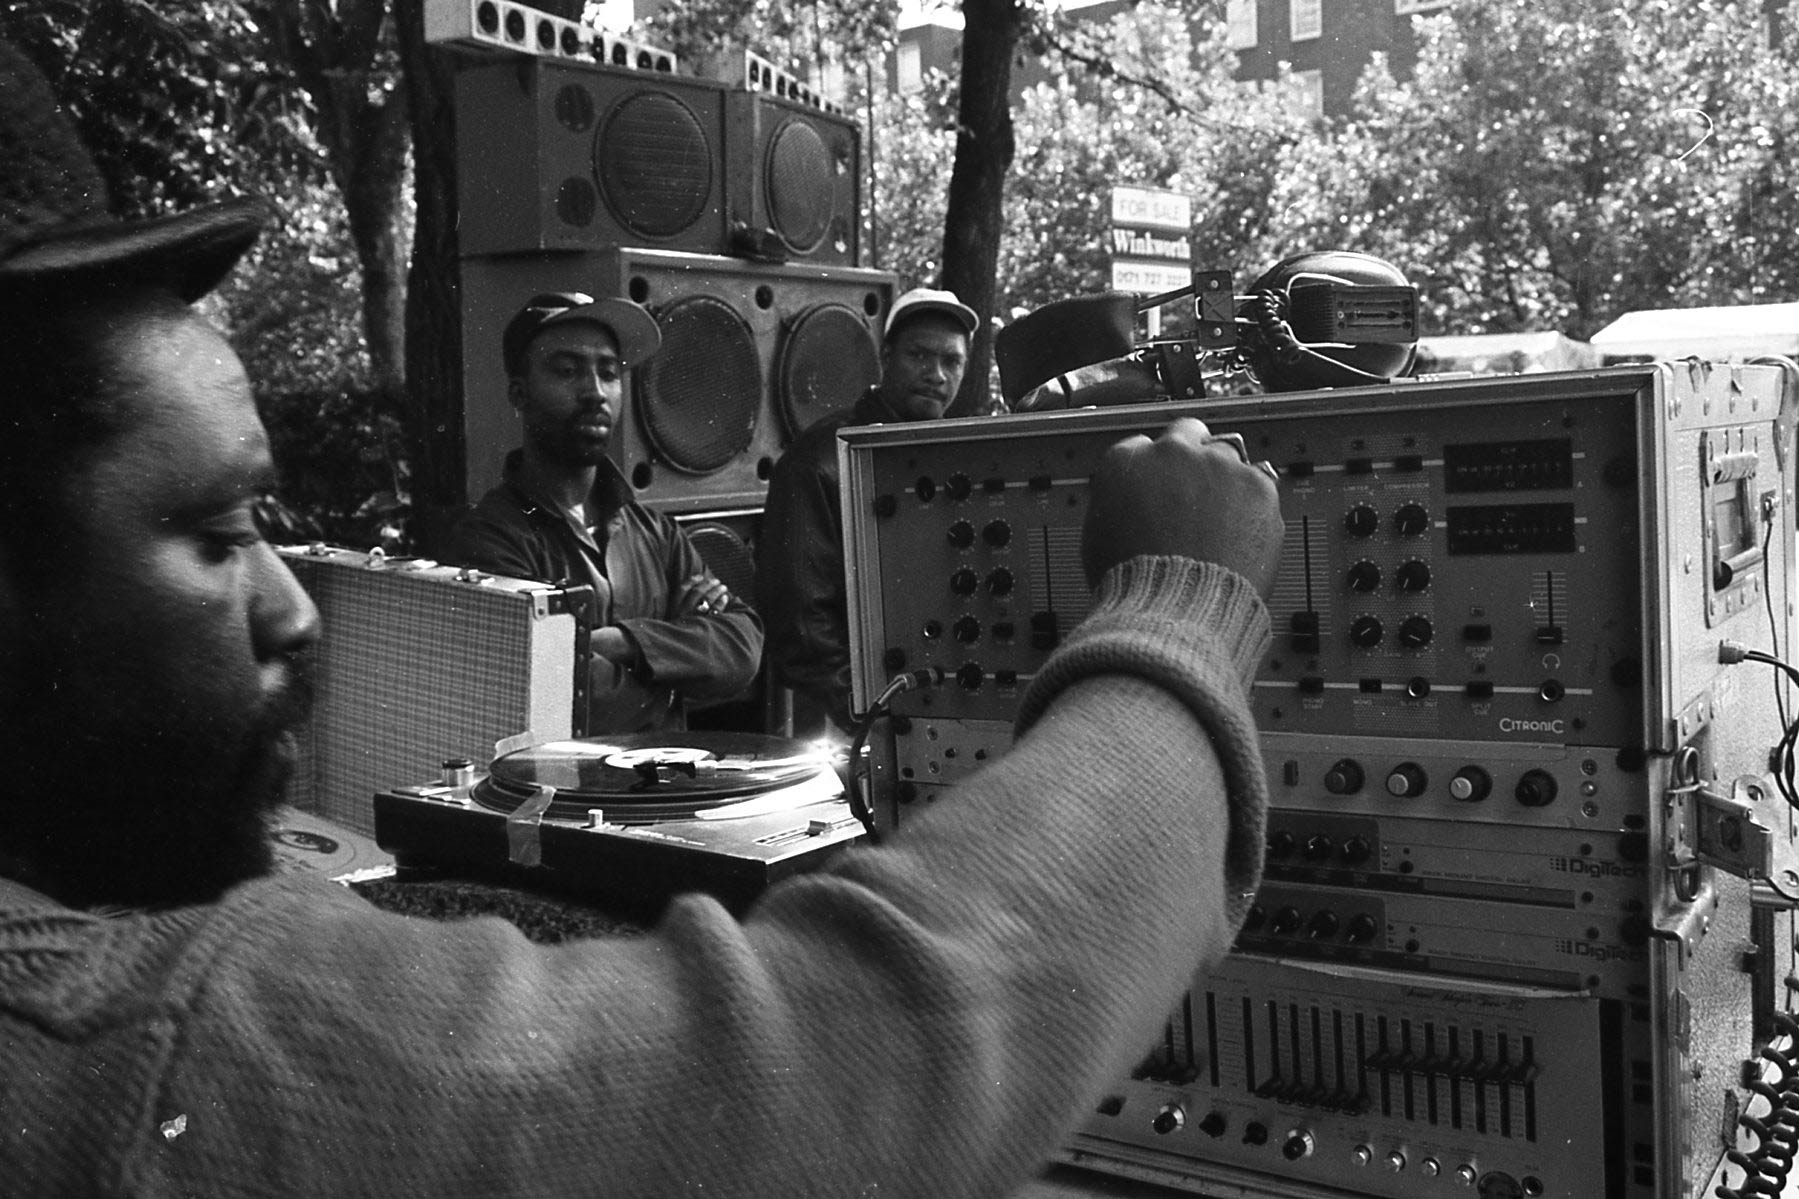 everpress-blog-channel-one-soundsystem-mikey-dread-carnival